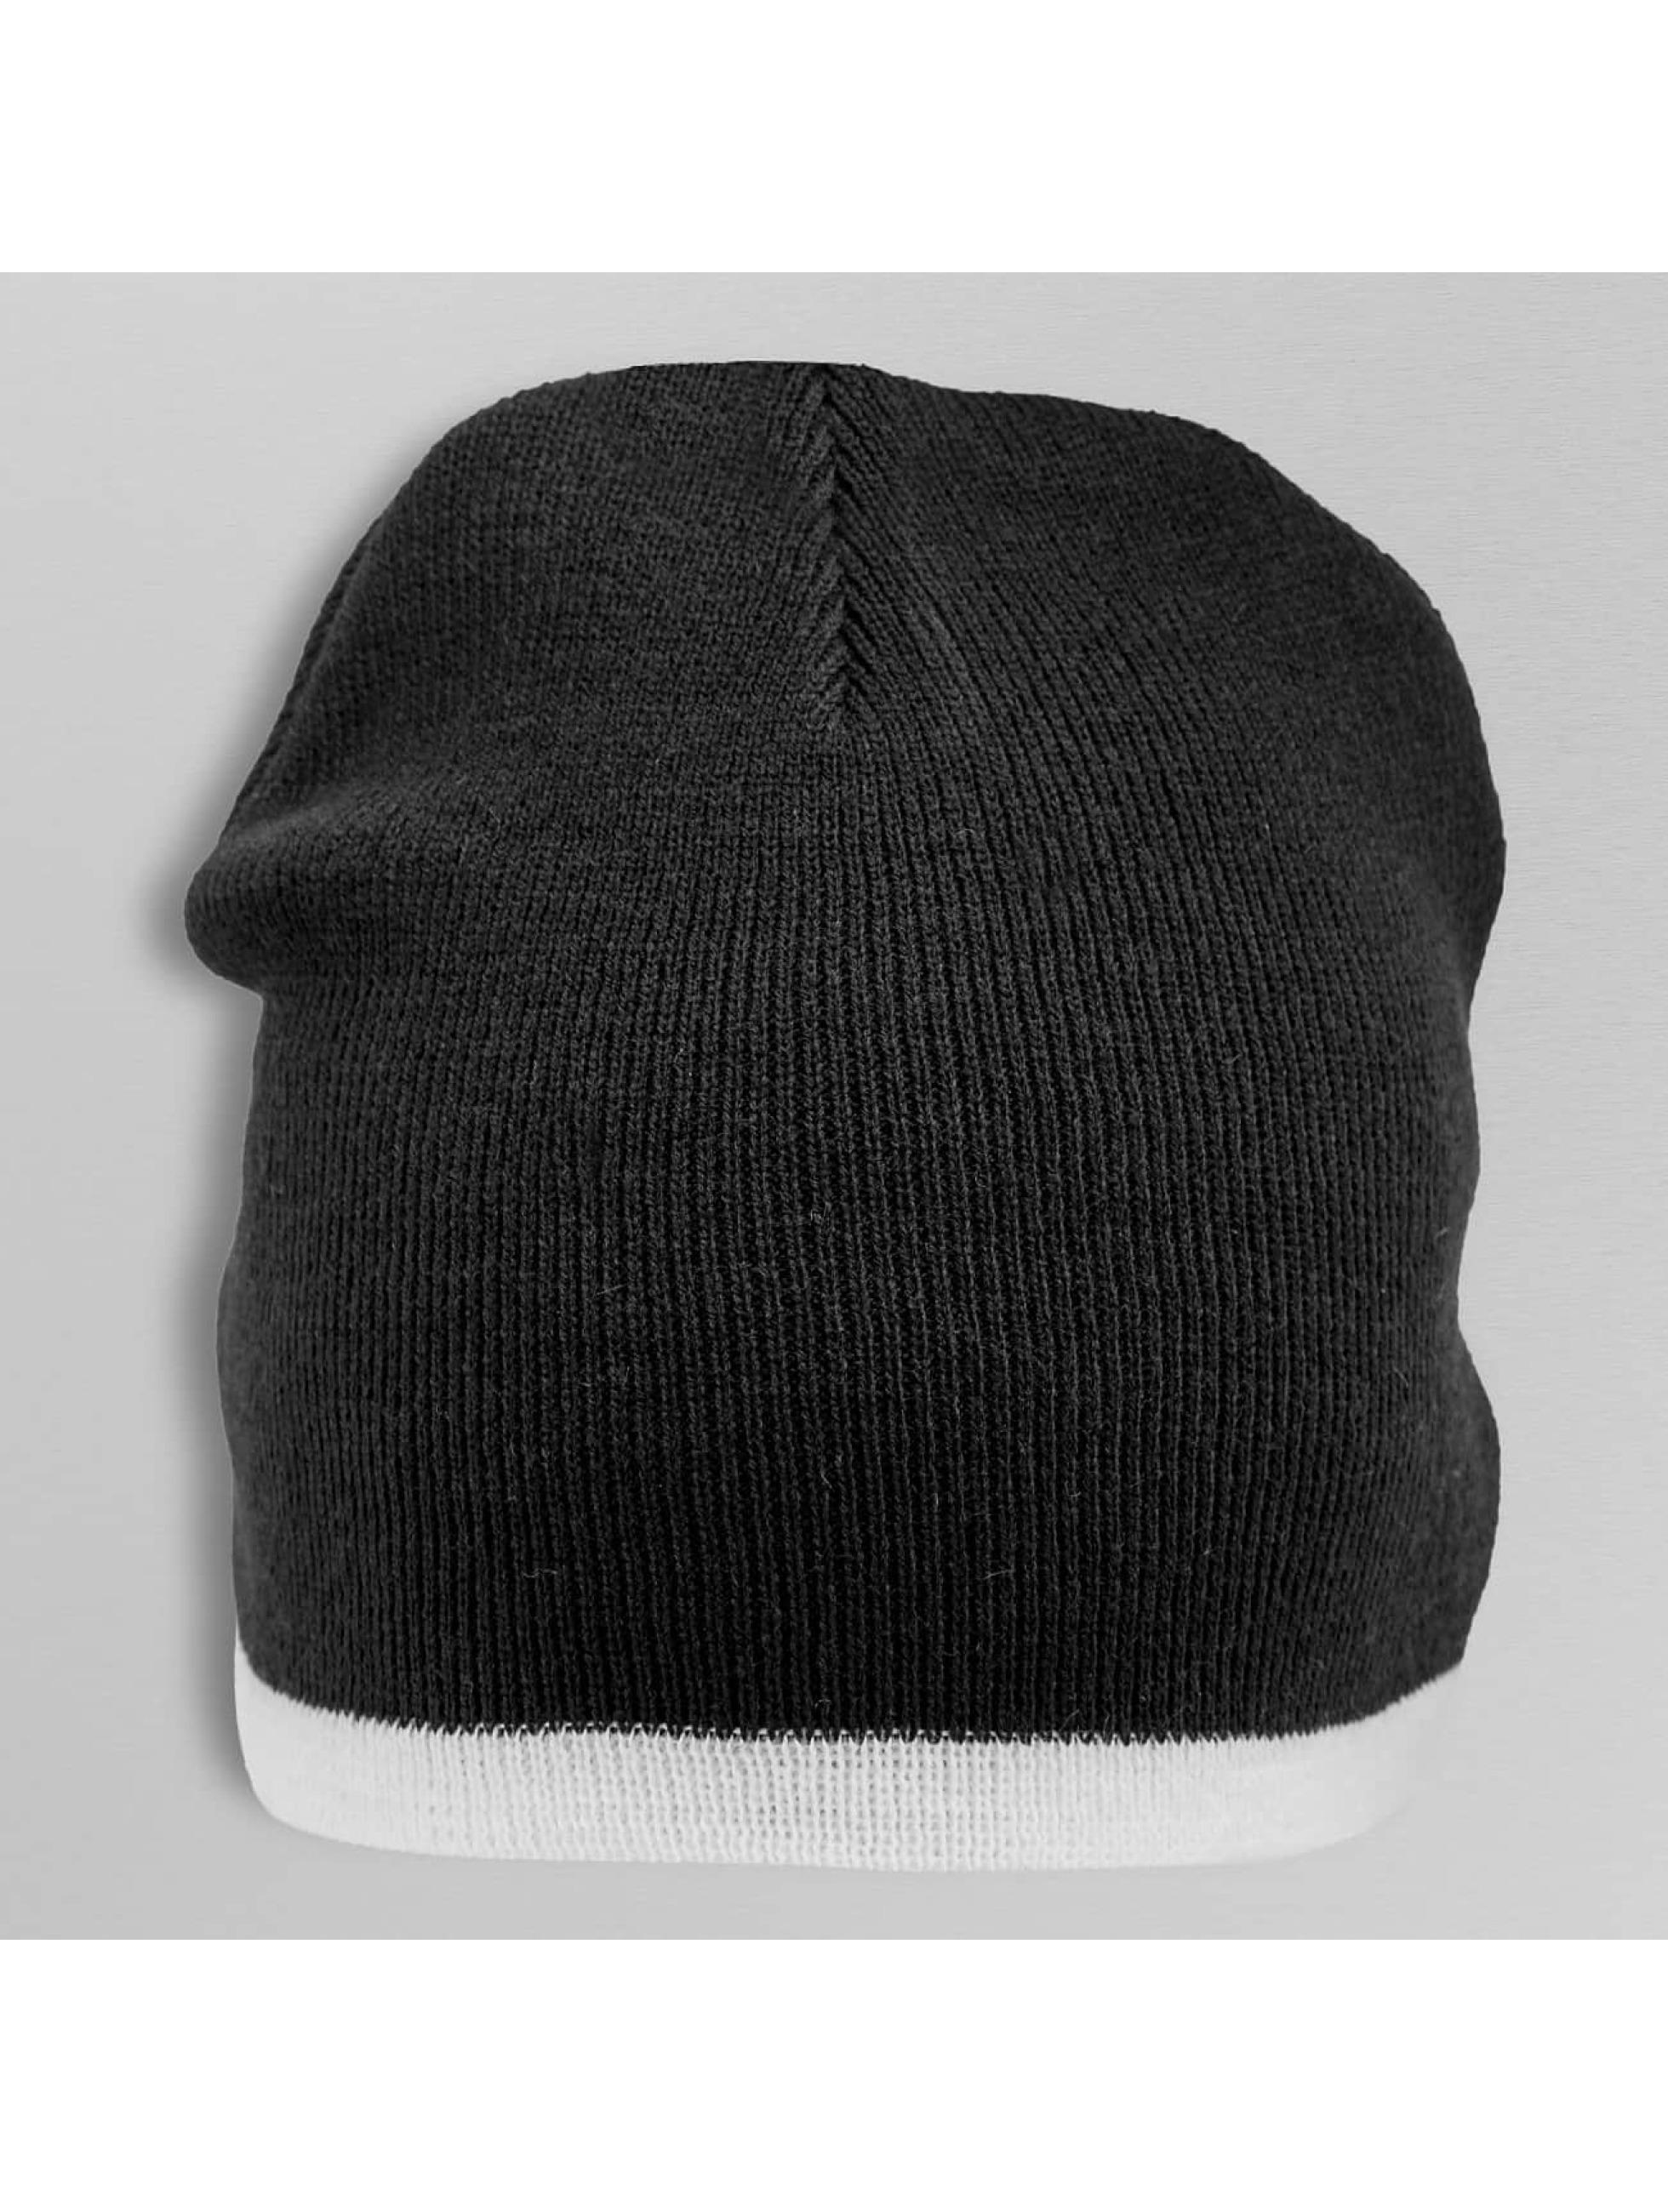 Cap Crony шляпа Single Striped черный